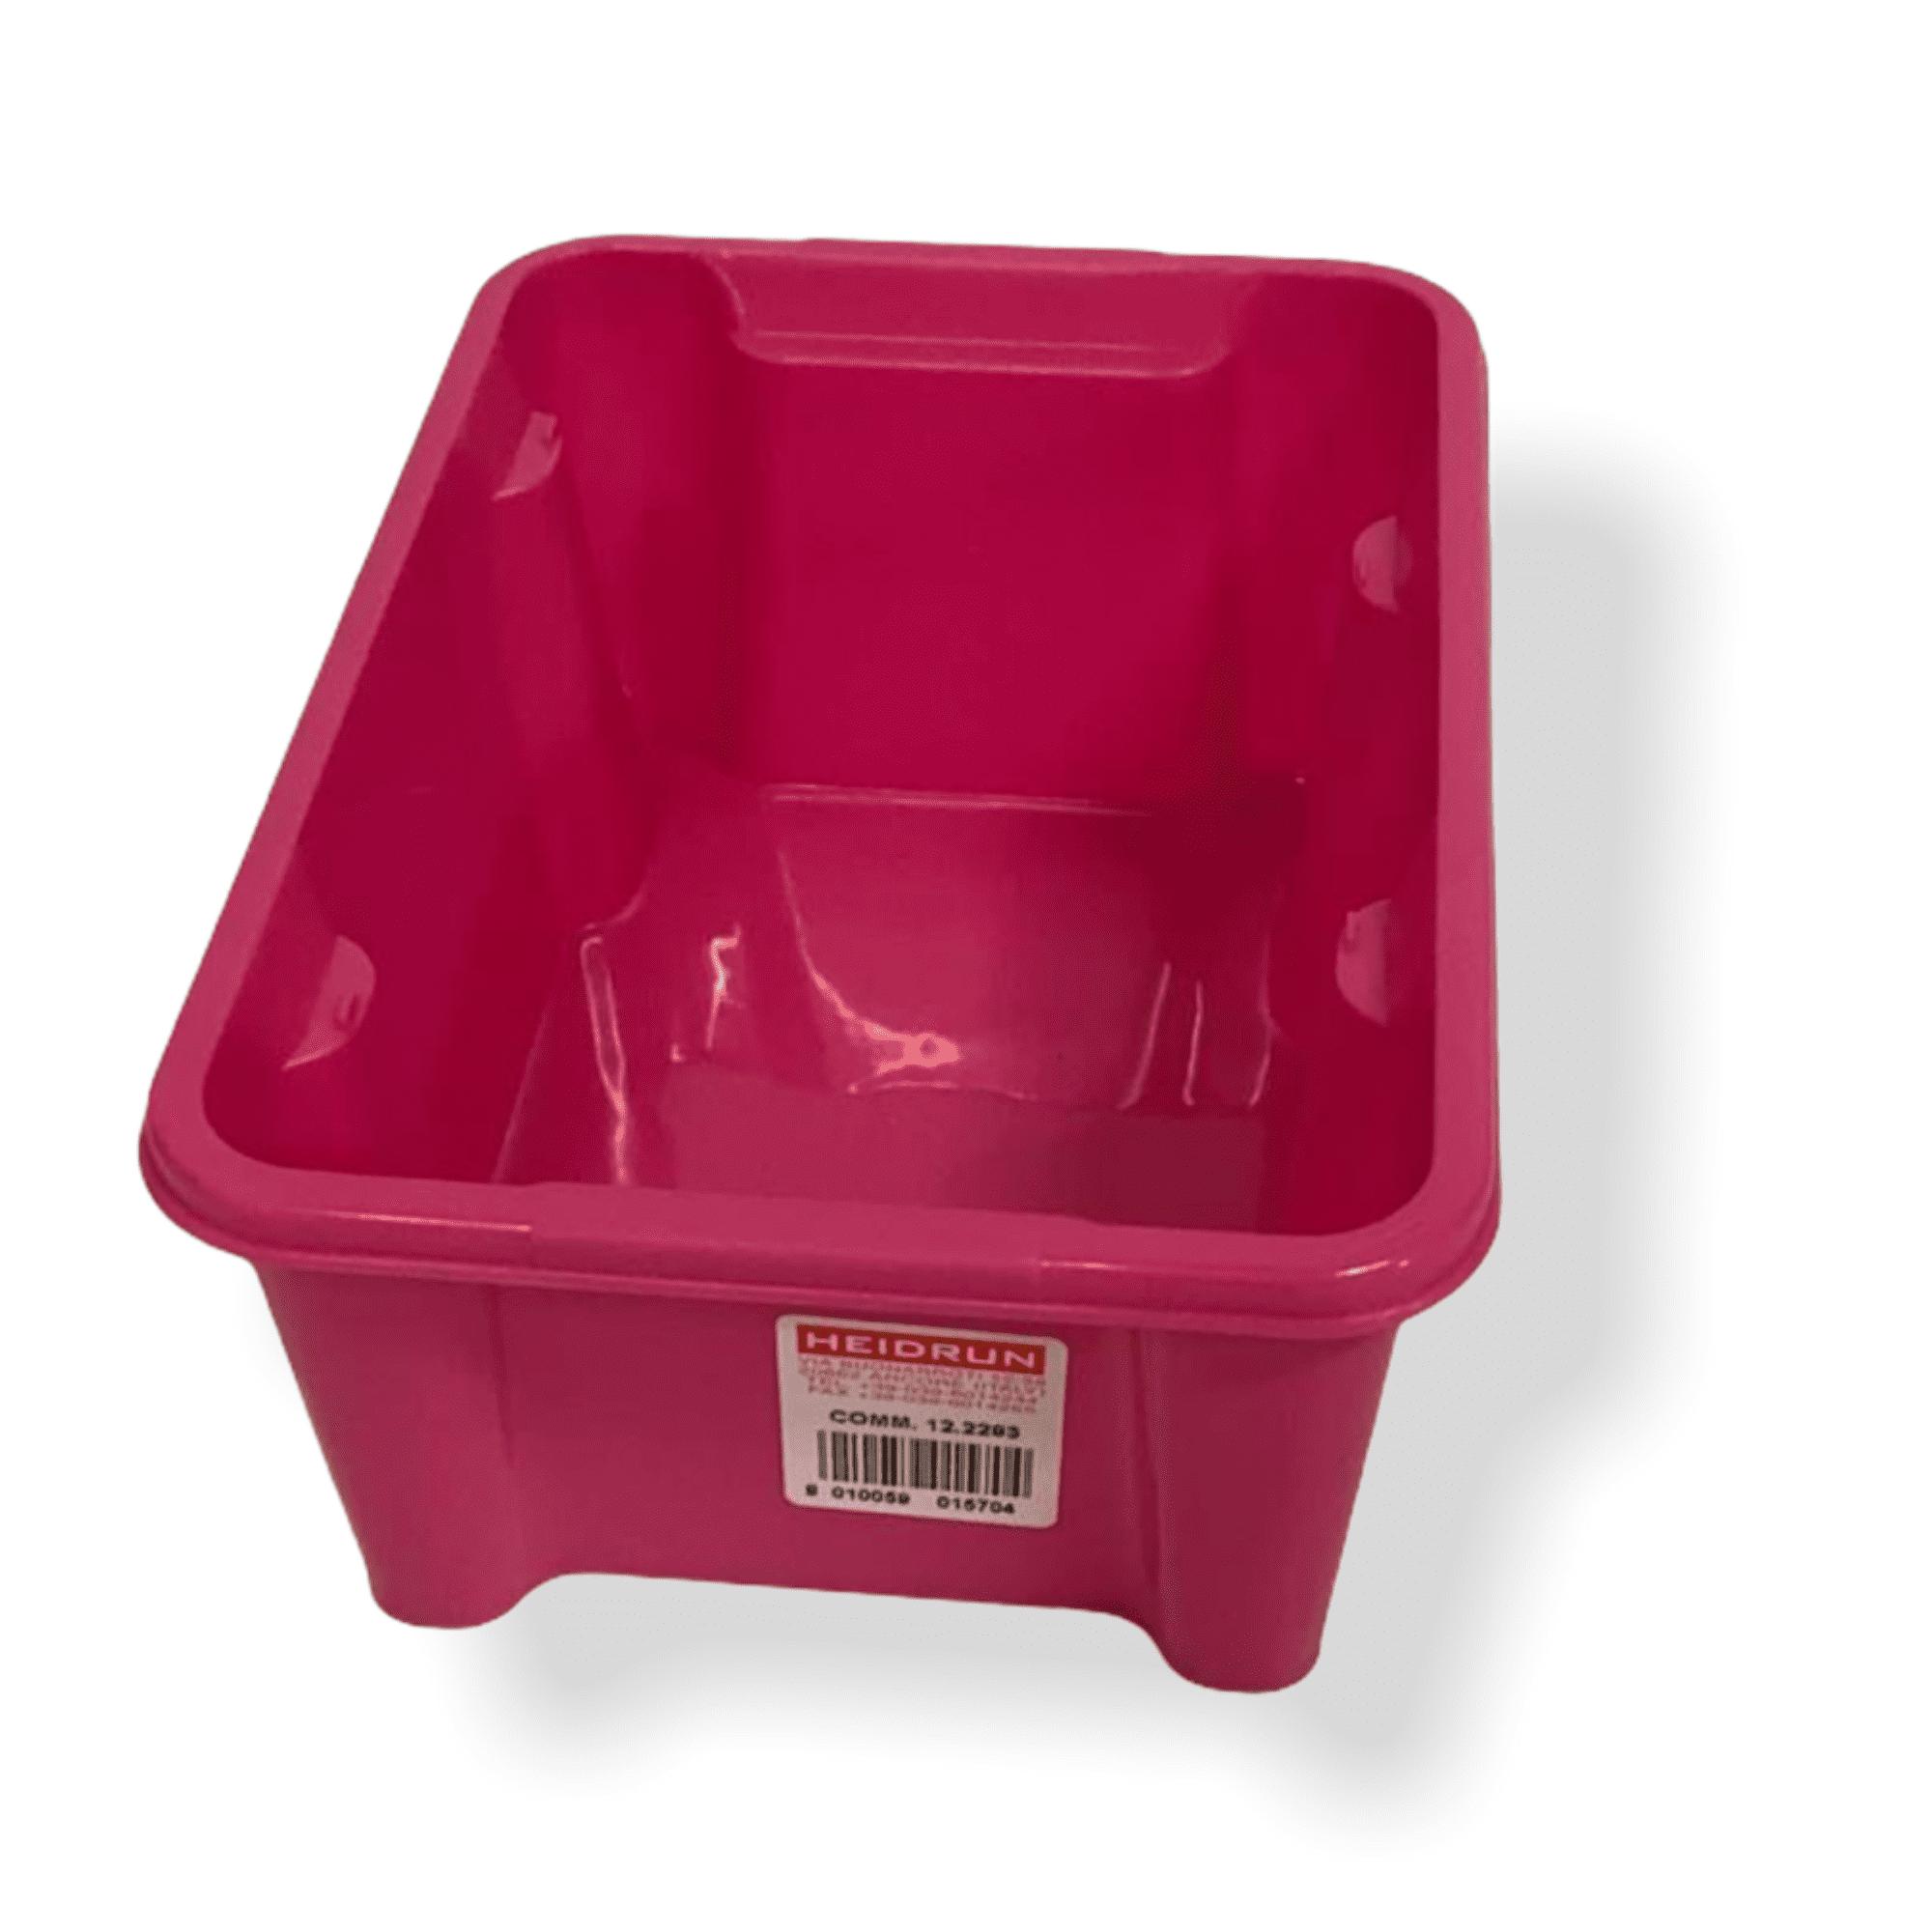 Stapelbox in 1,5 l